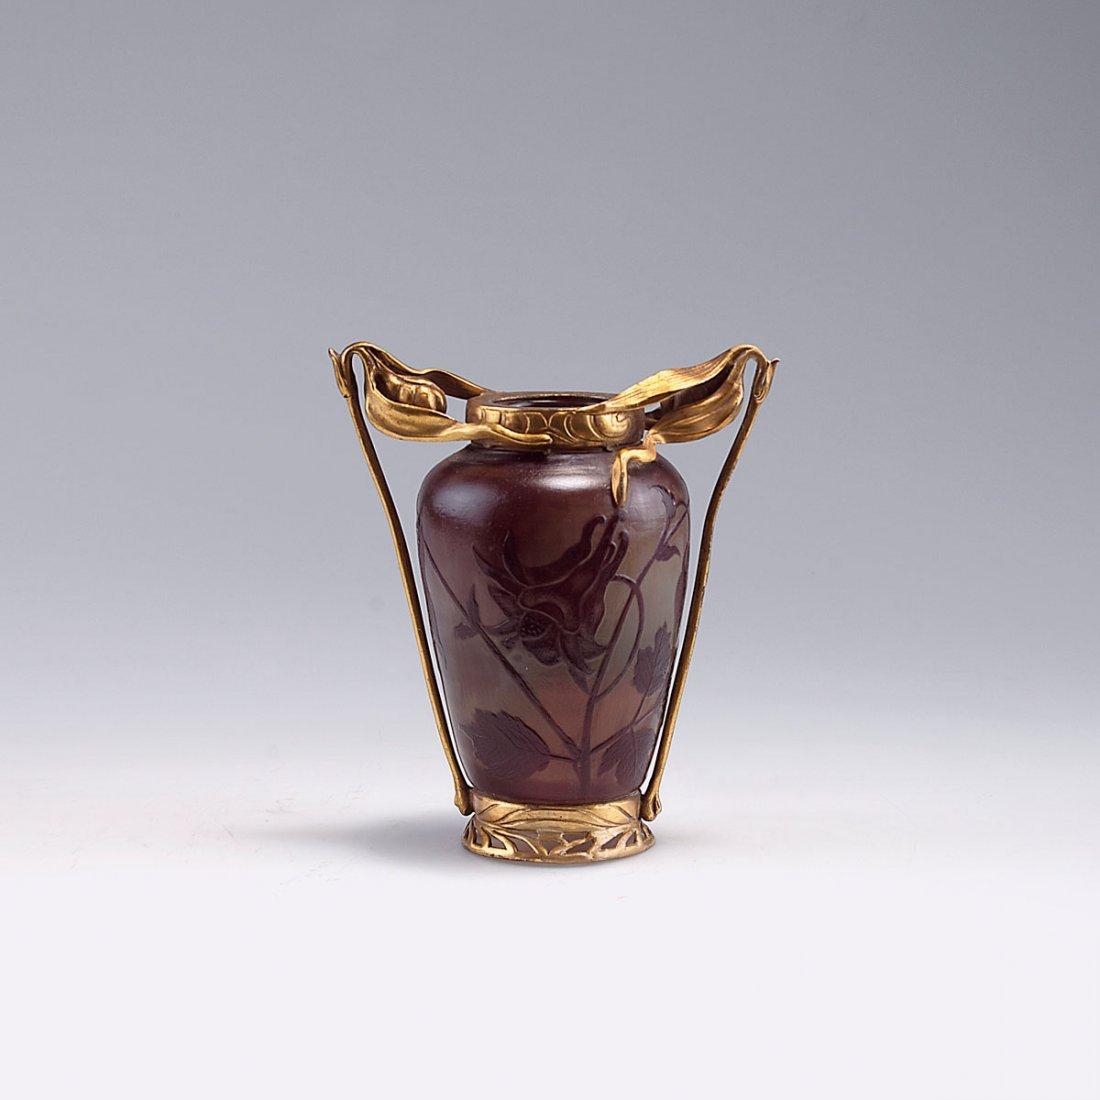 'Ancolies' vase, c1900